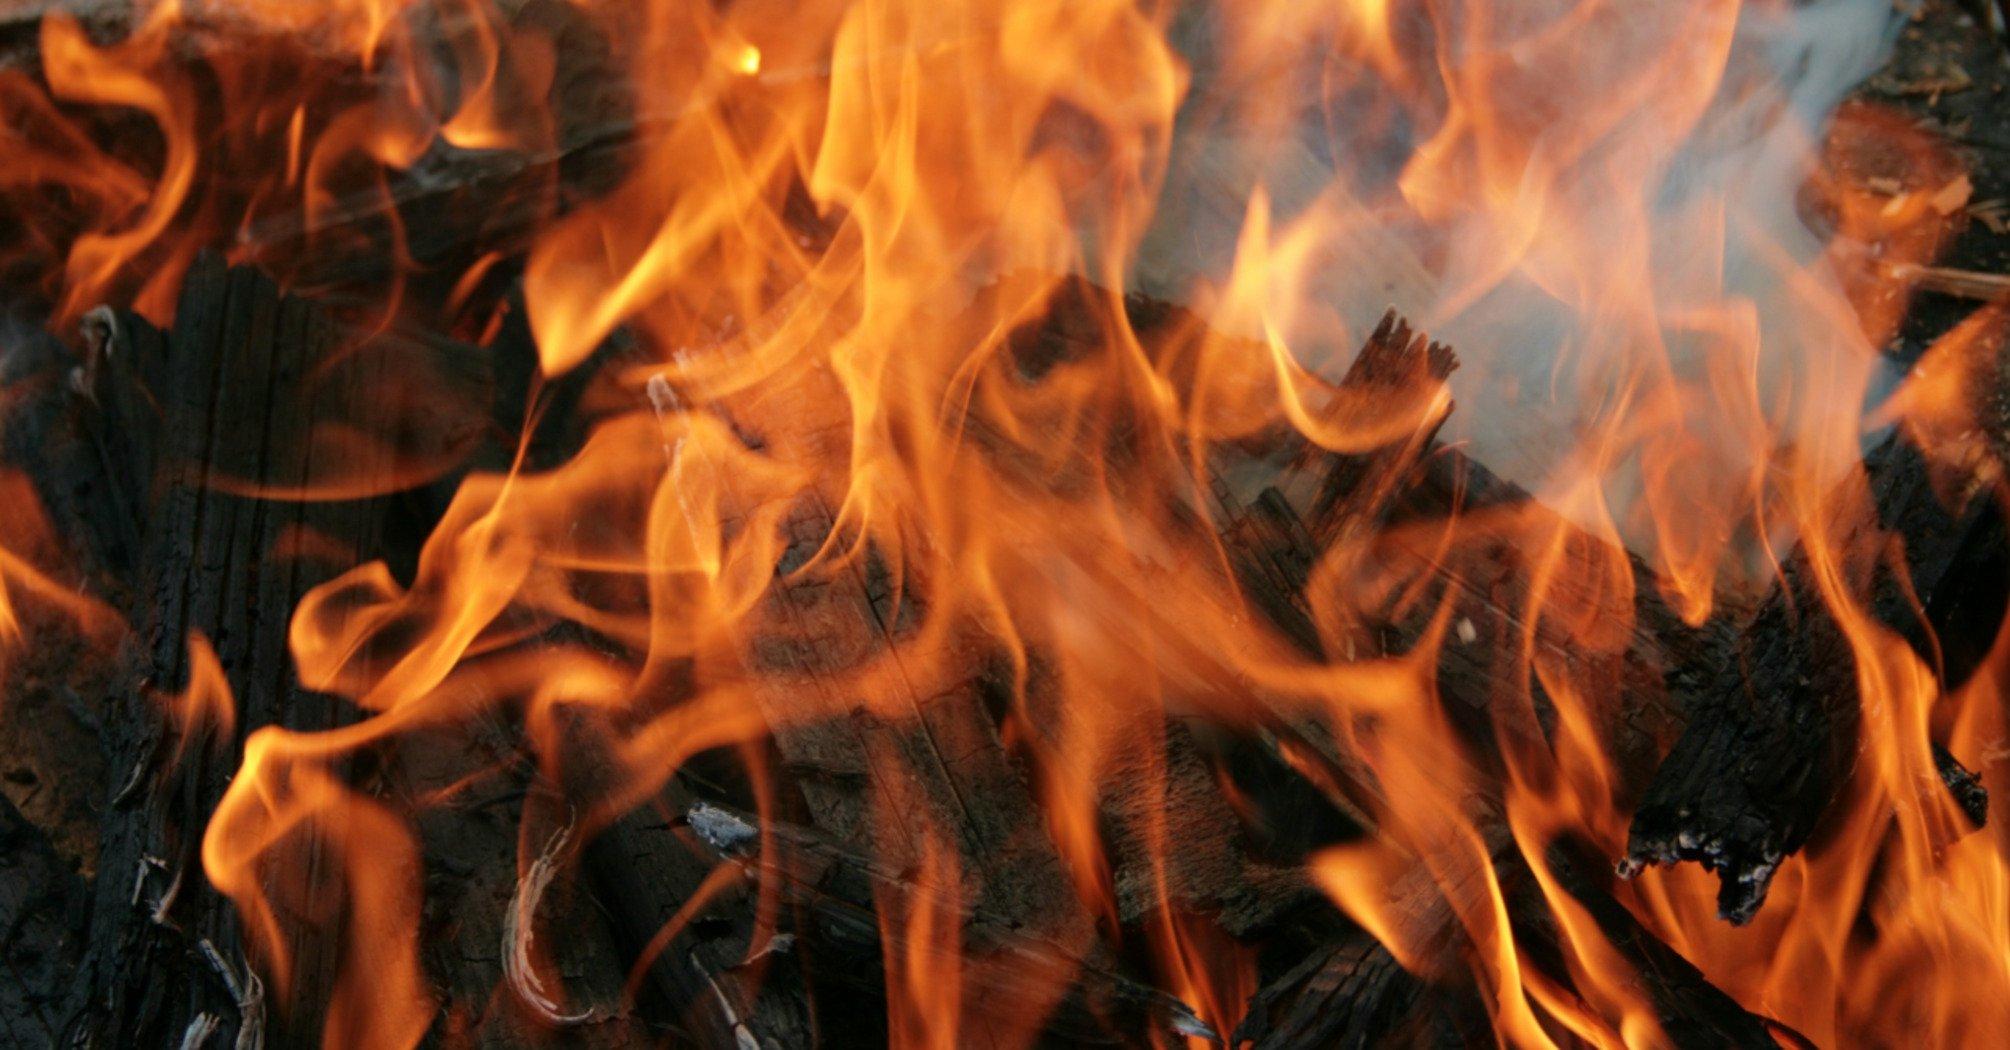 """До зими вигорить вся країна..."" В ДСНС стурбовані пожежами в екосистемах України"